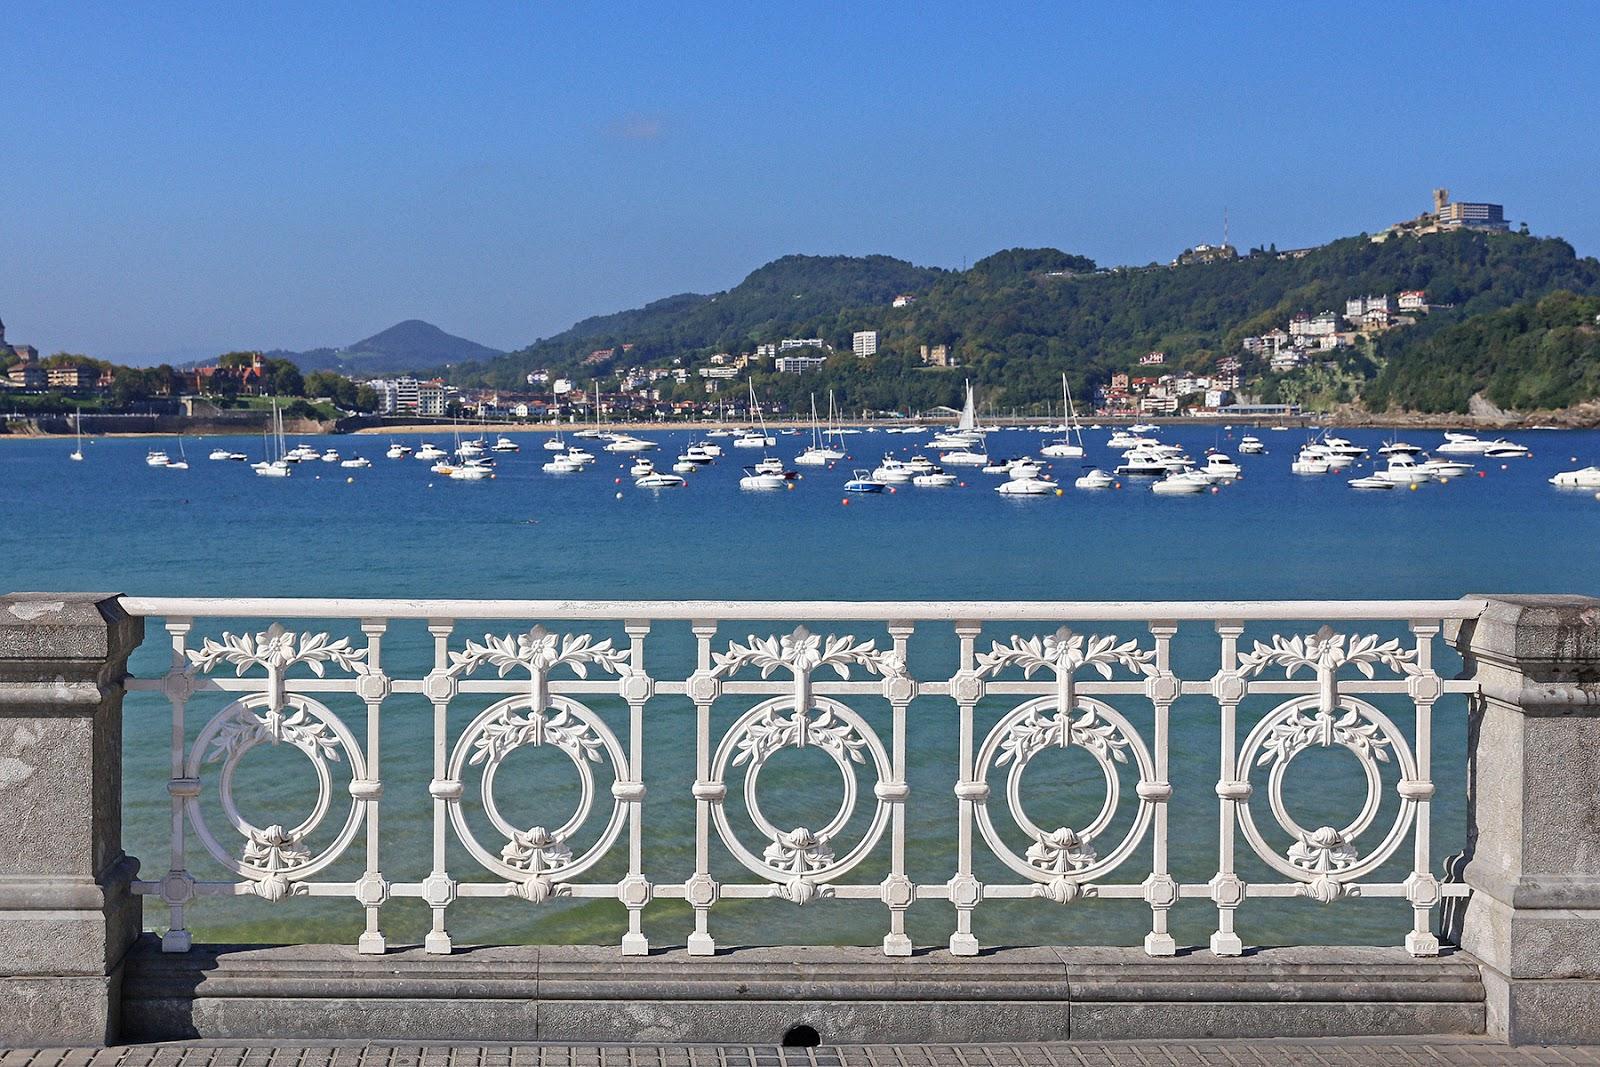 Spain: San Sebastian, Guggenheim Museum Bilbao, & 3 Michelin Star Restaurant ABaC Barcelona